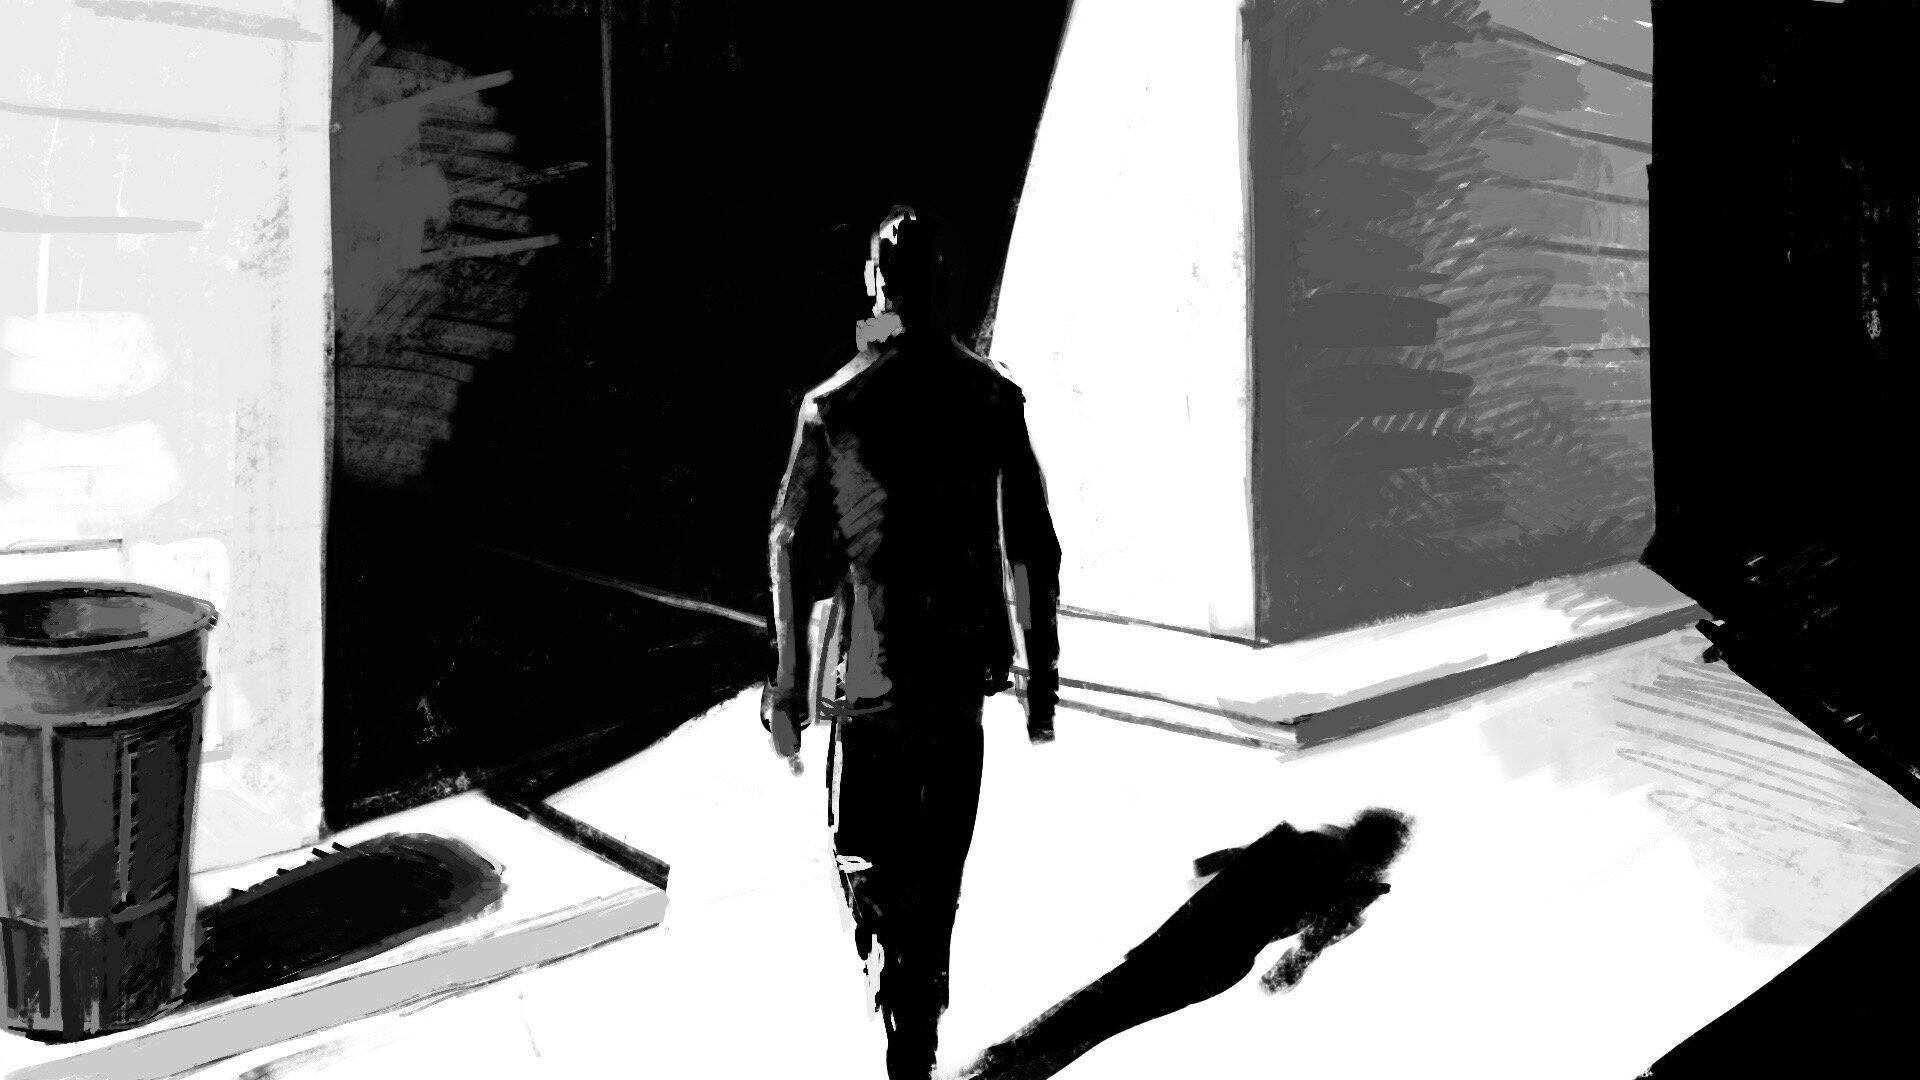 walking into the dark